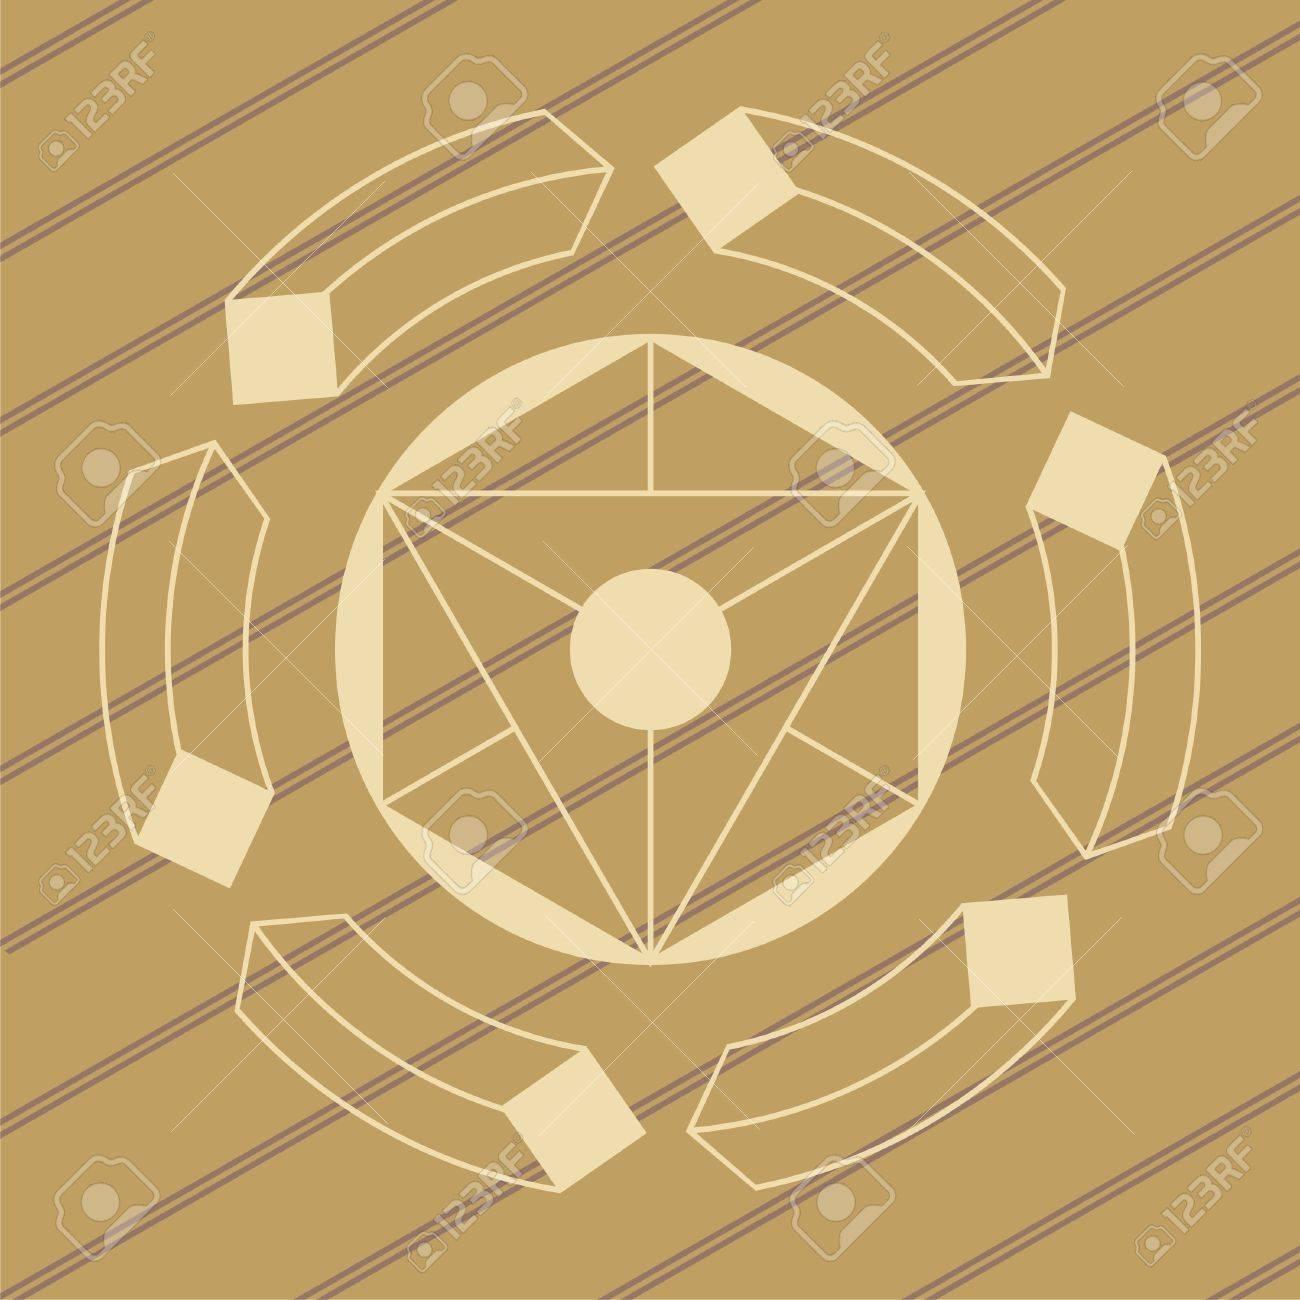 ufo crop circles design in wheat/corn fields Stock Vector - 9931349